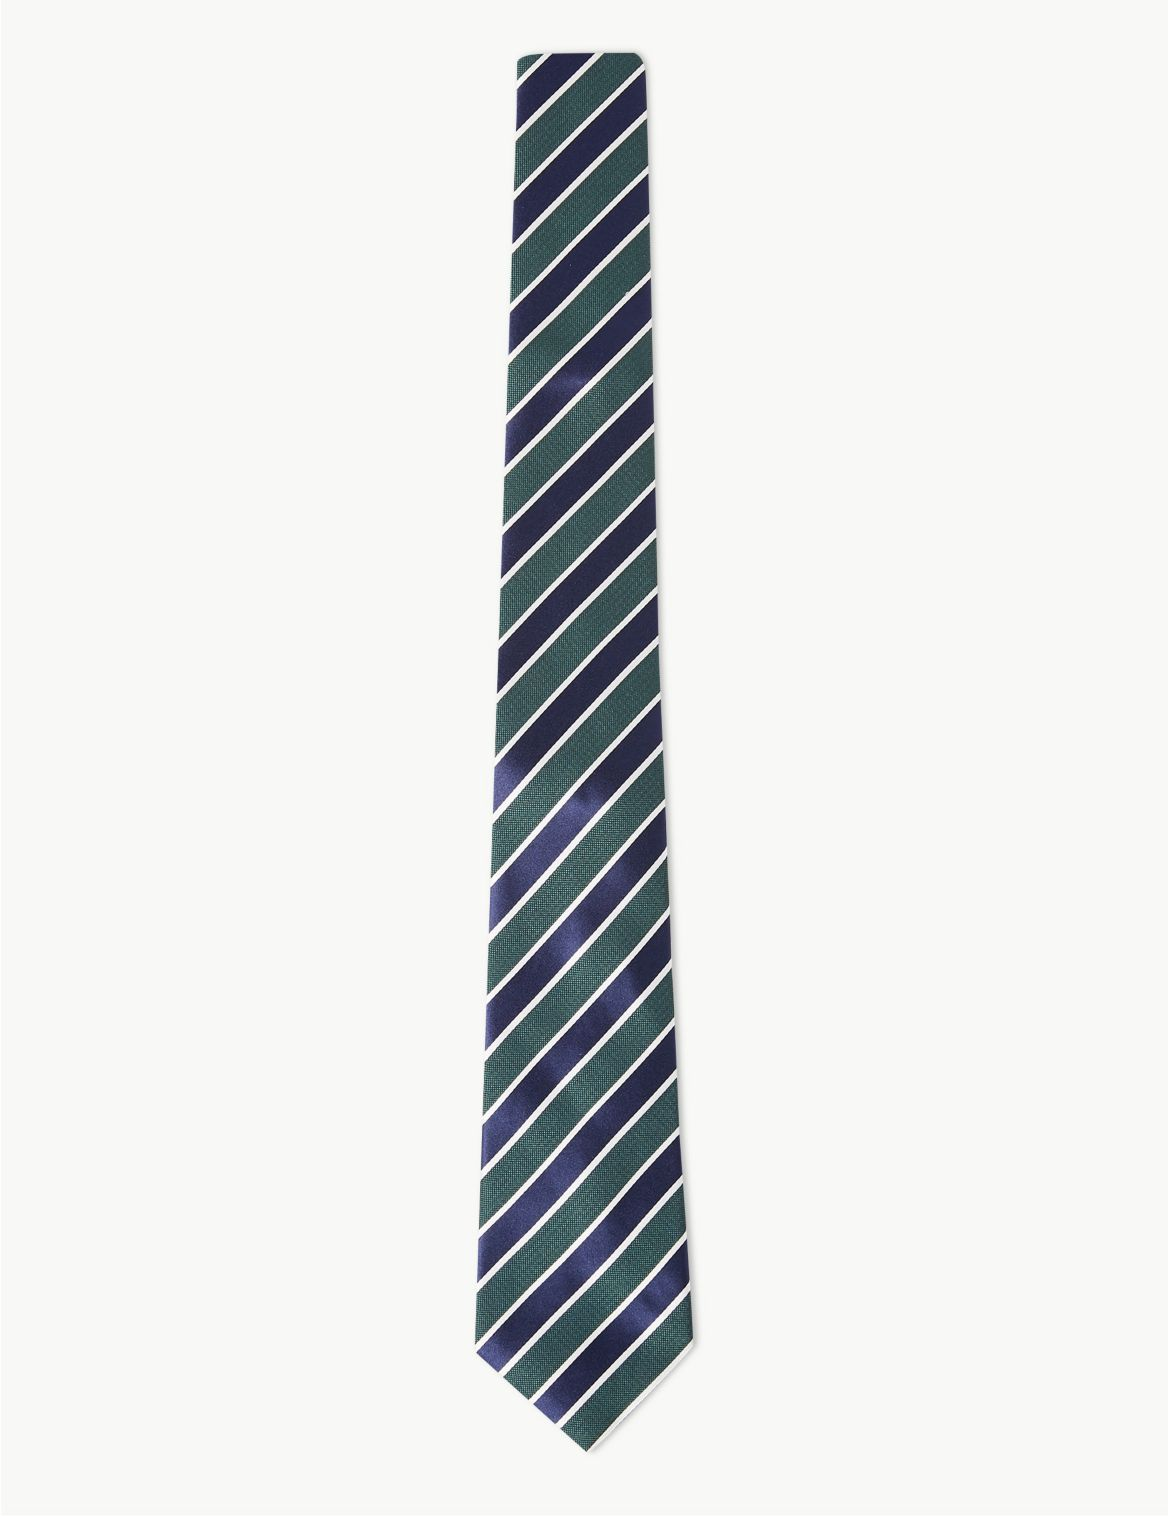 Cravate Ă rayures